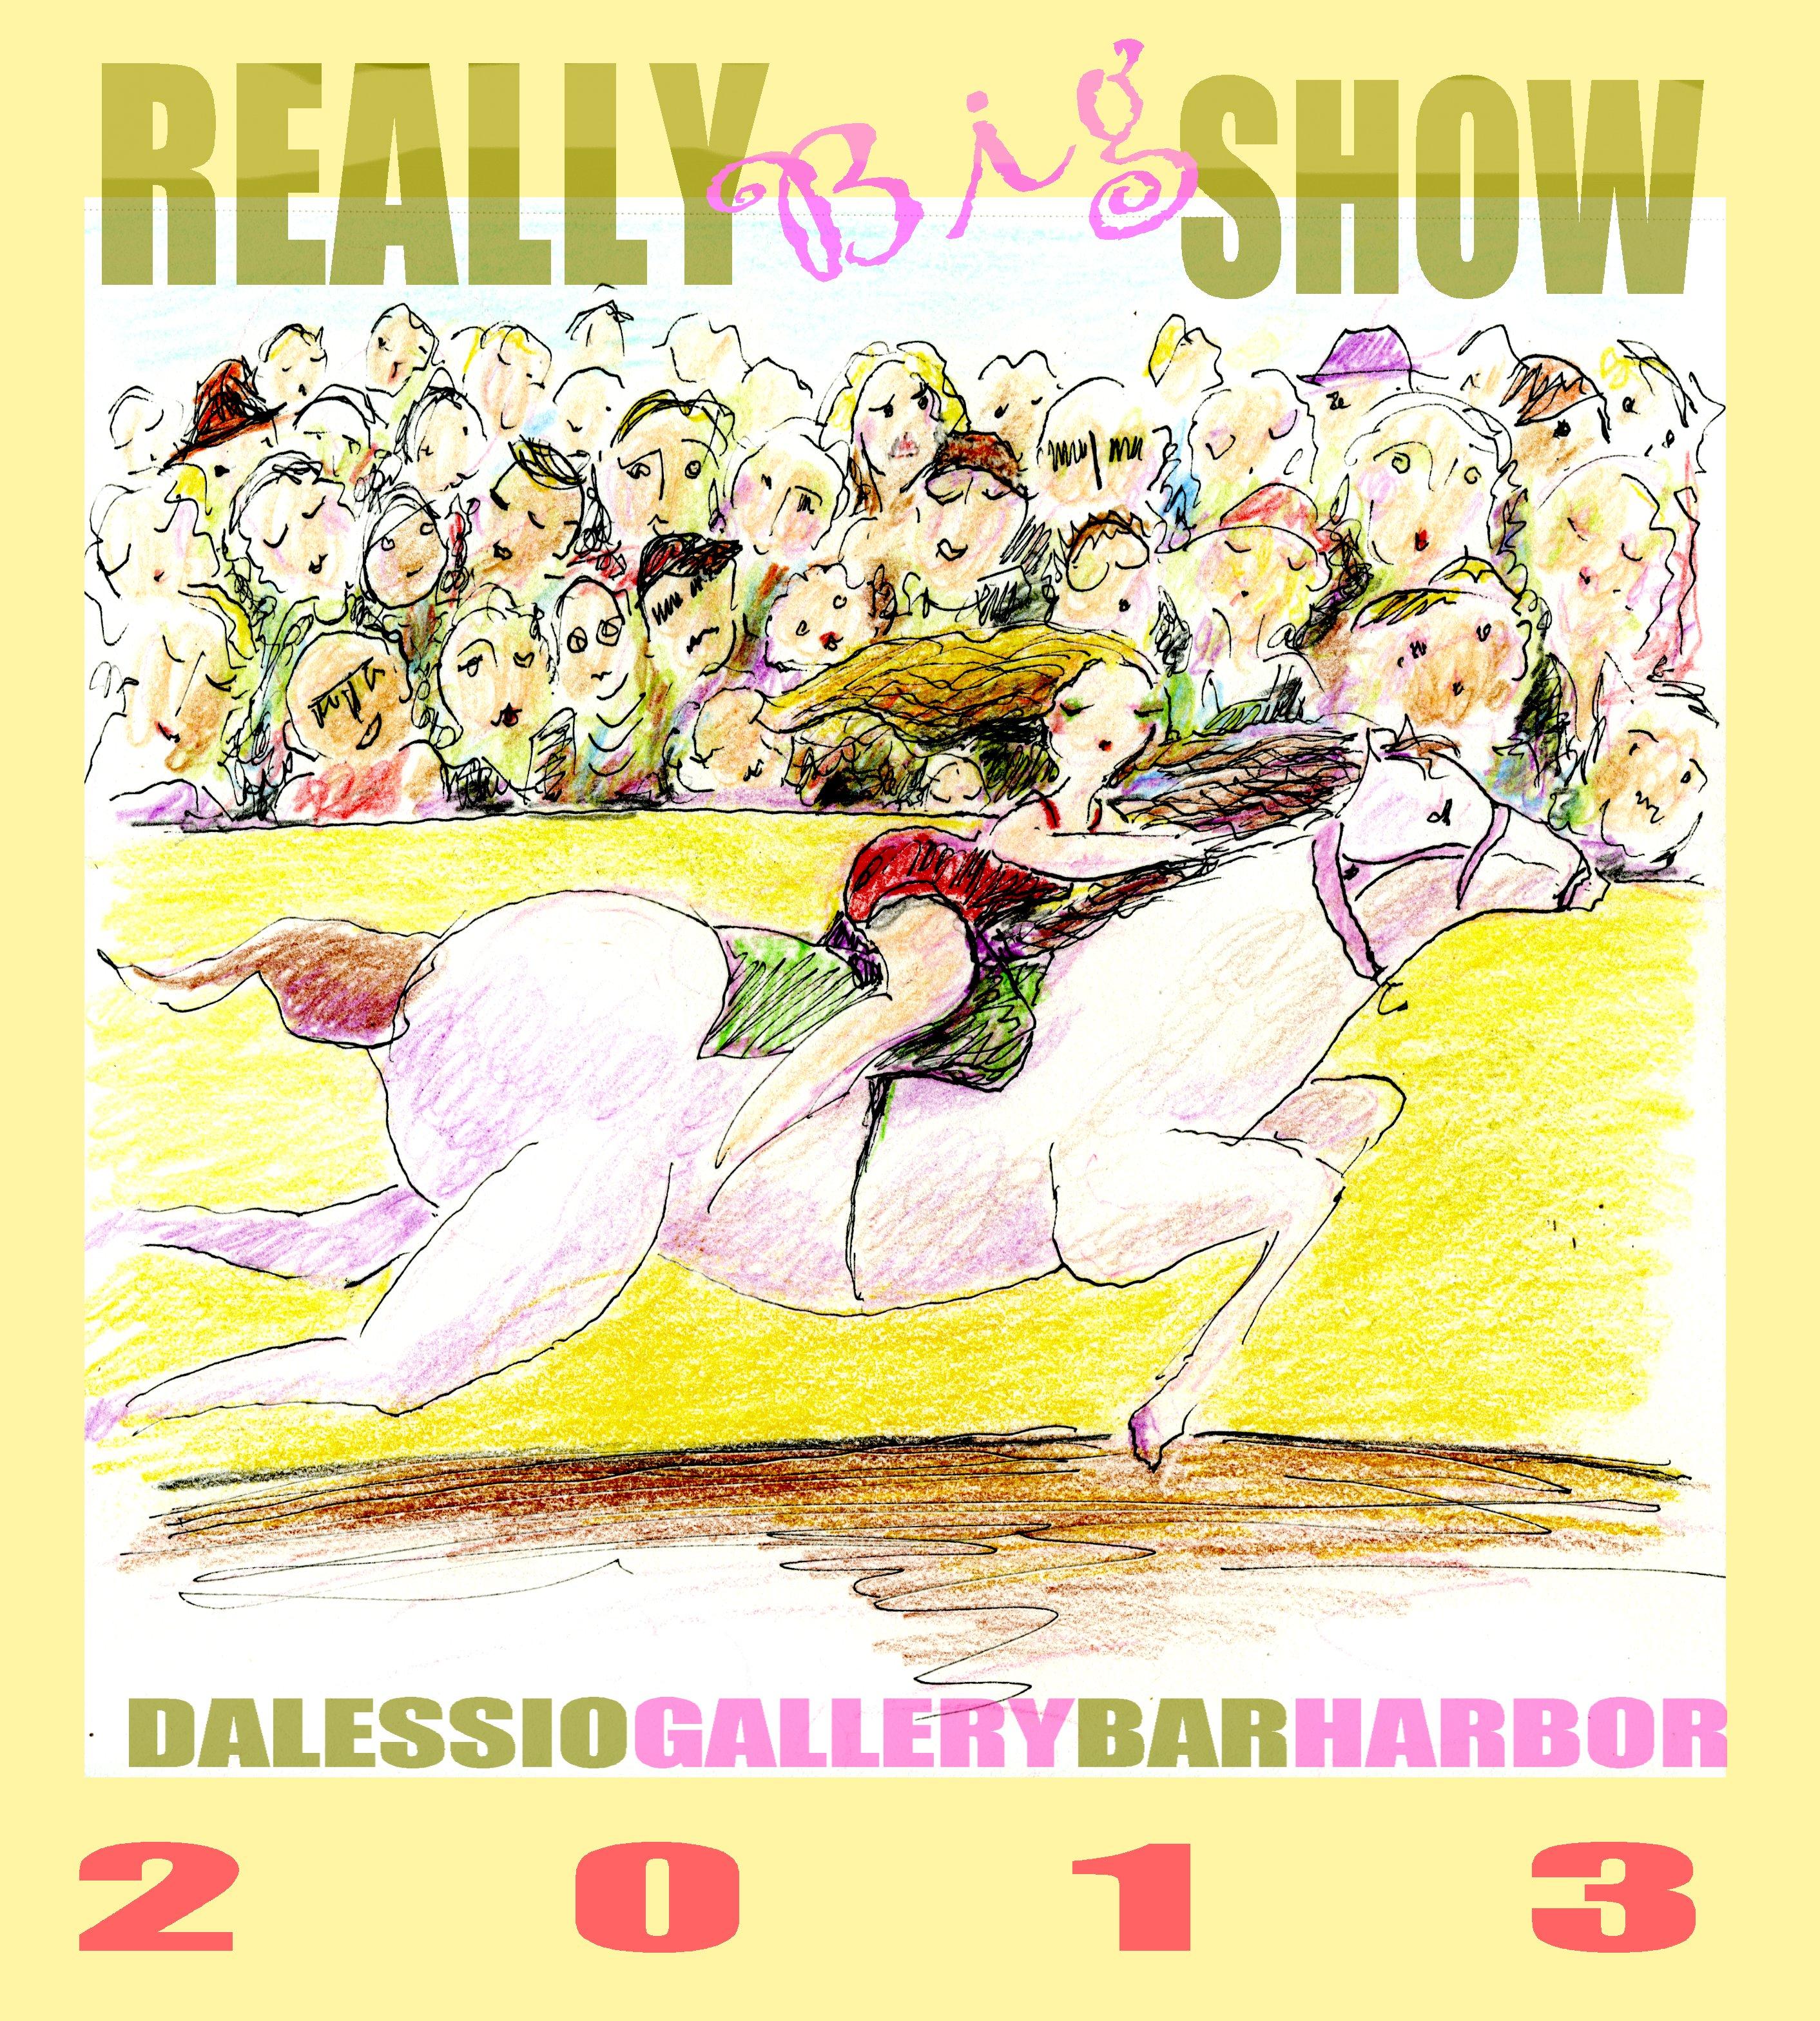 Big Show Poster